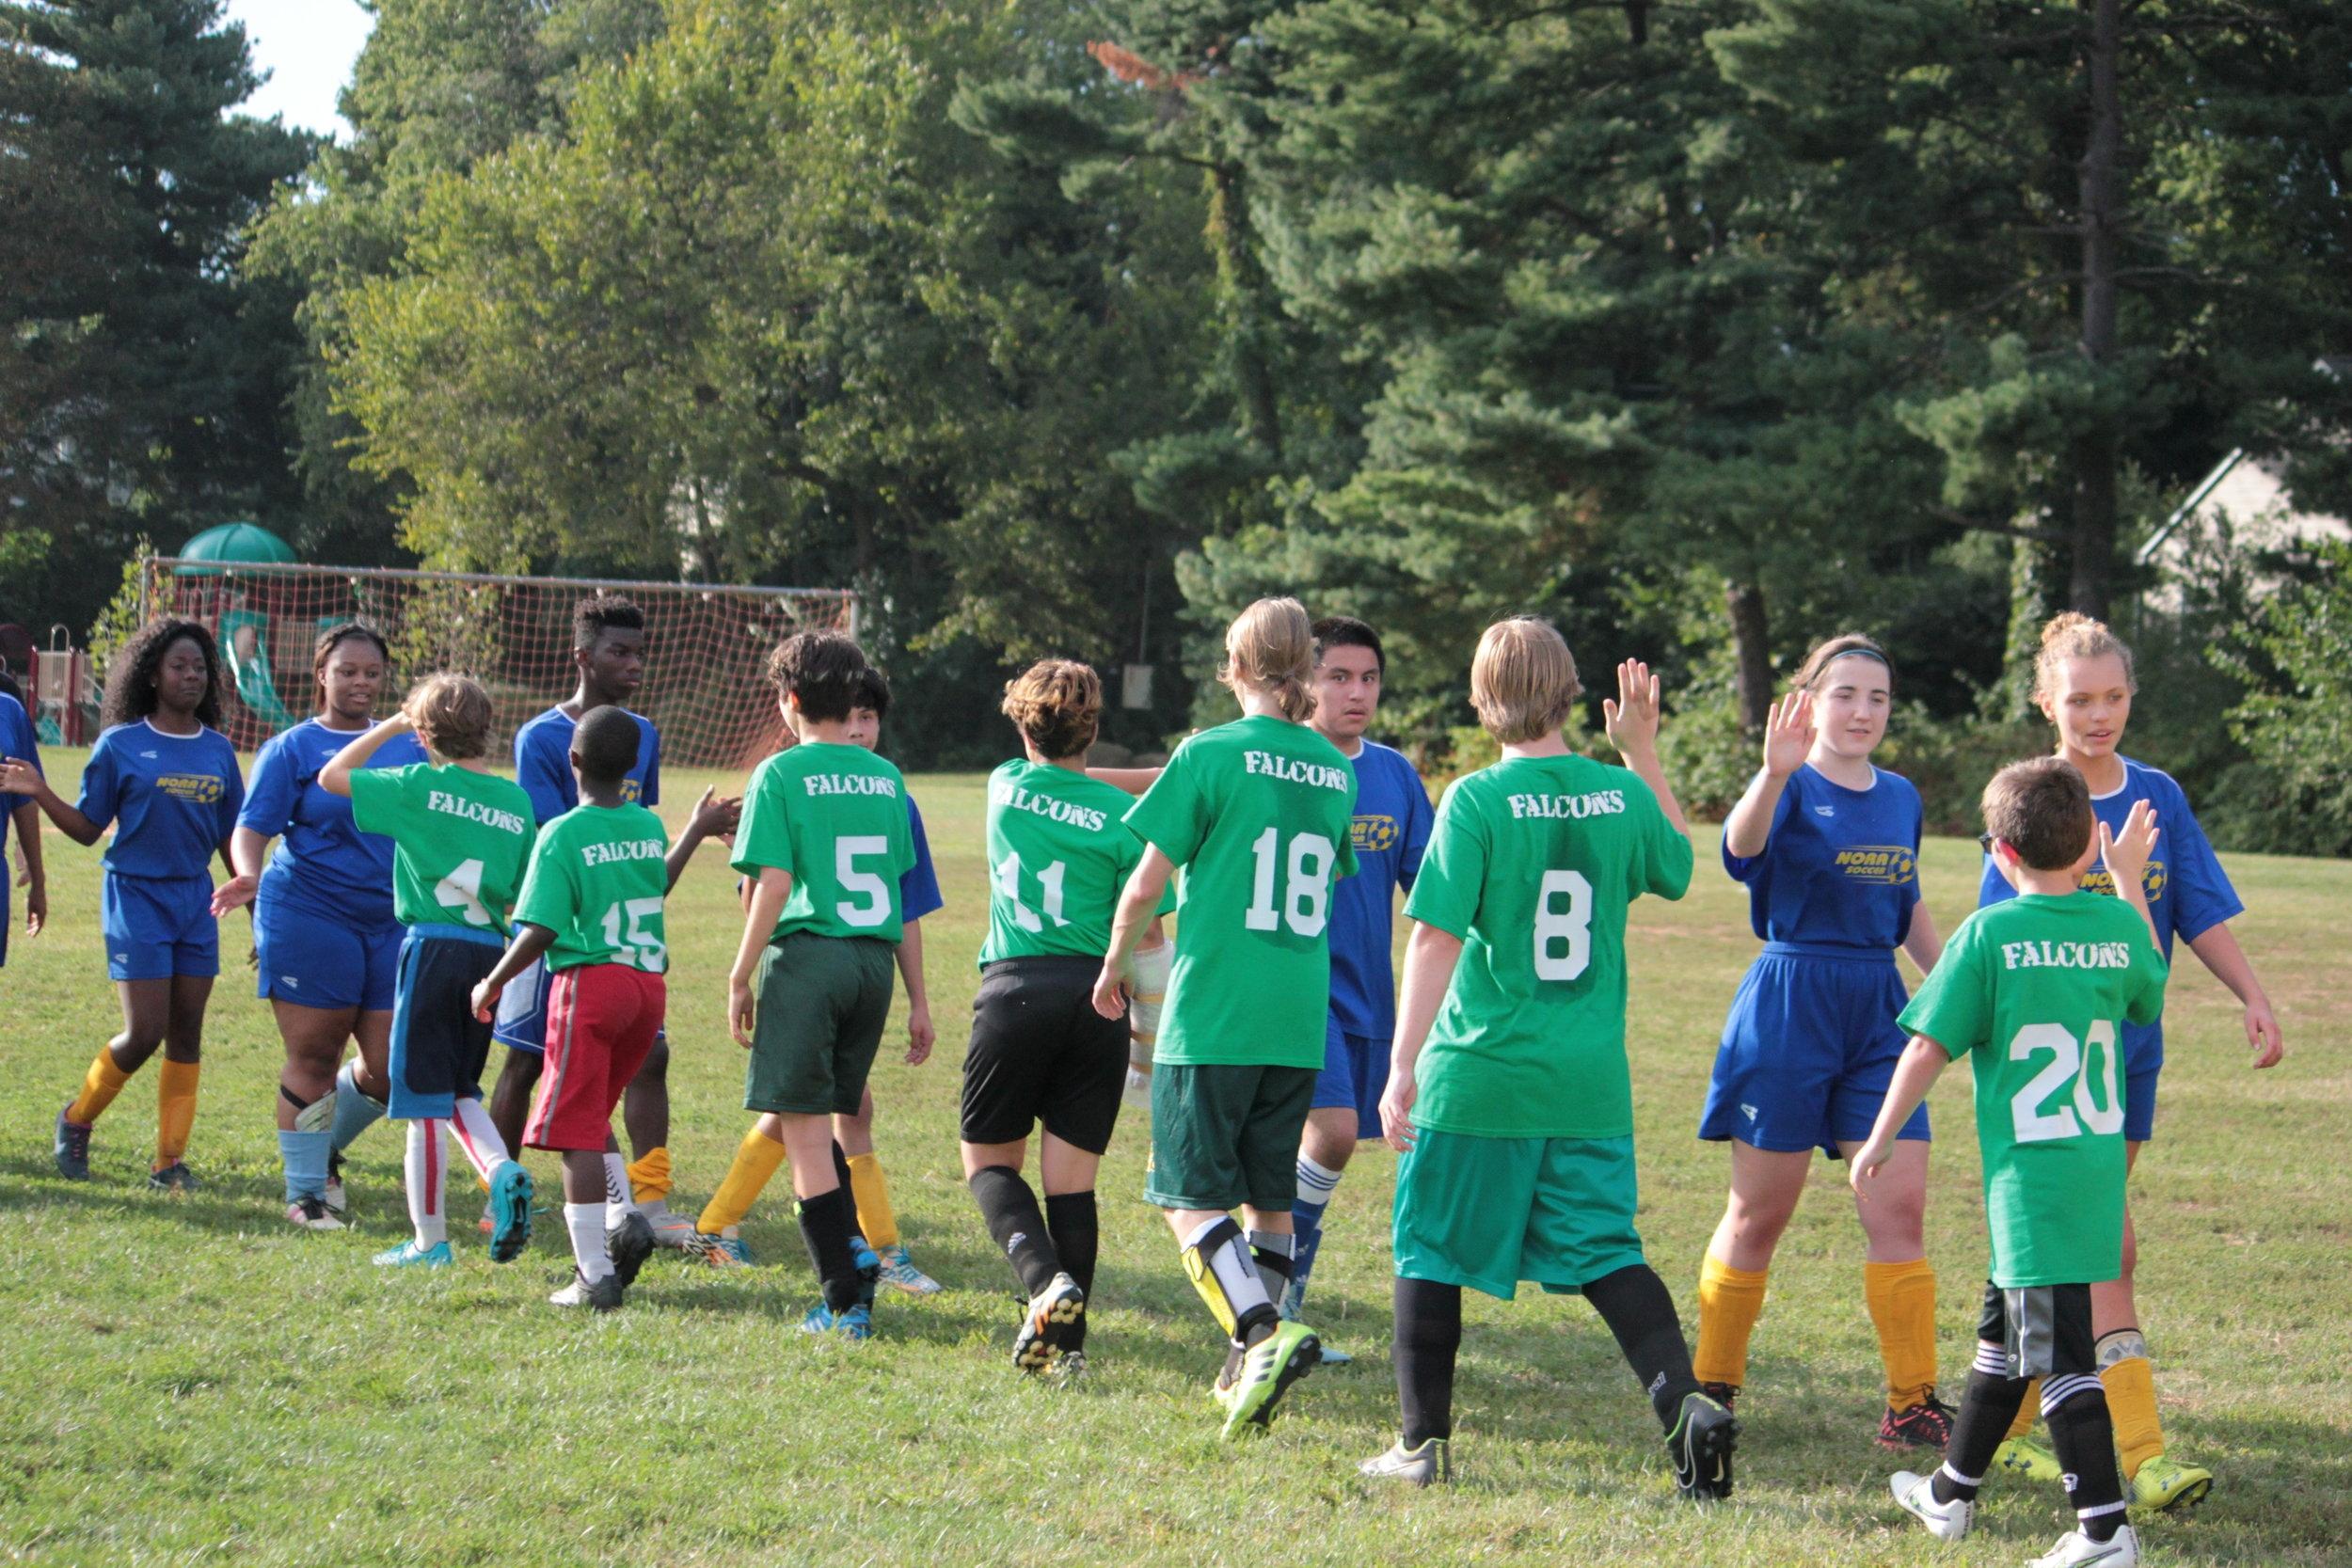 Our athletics program focuses on teamwork, sportsmanship and resilience above all else.